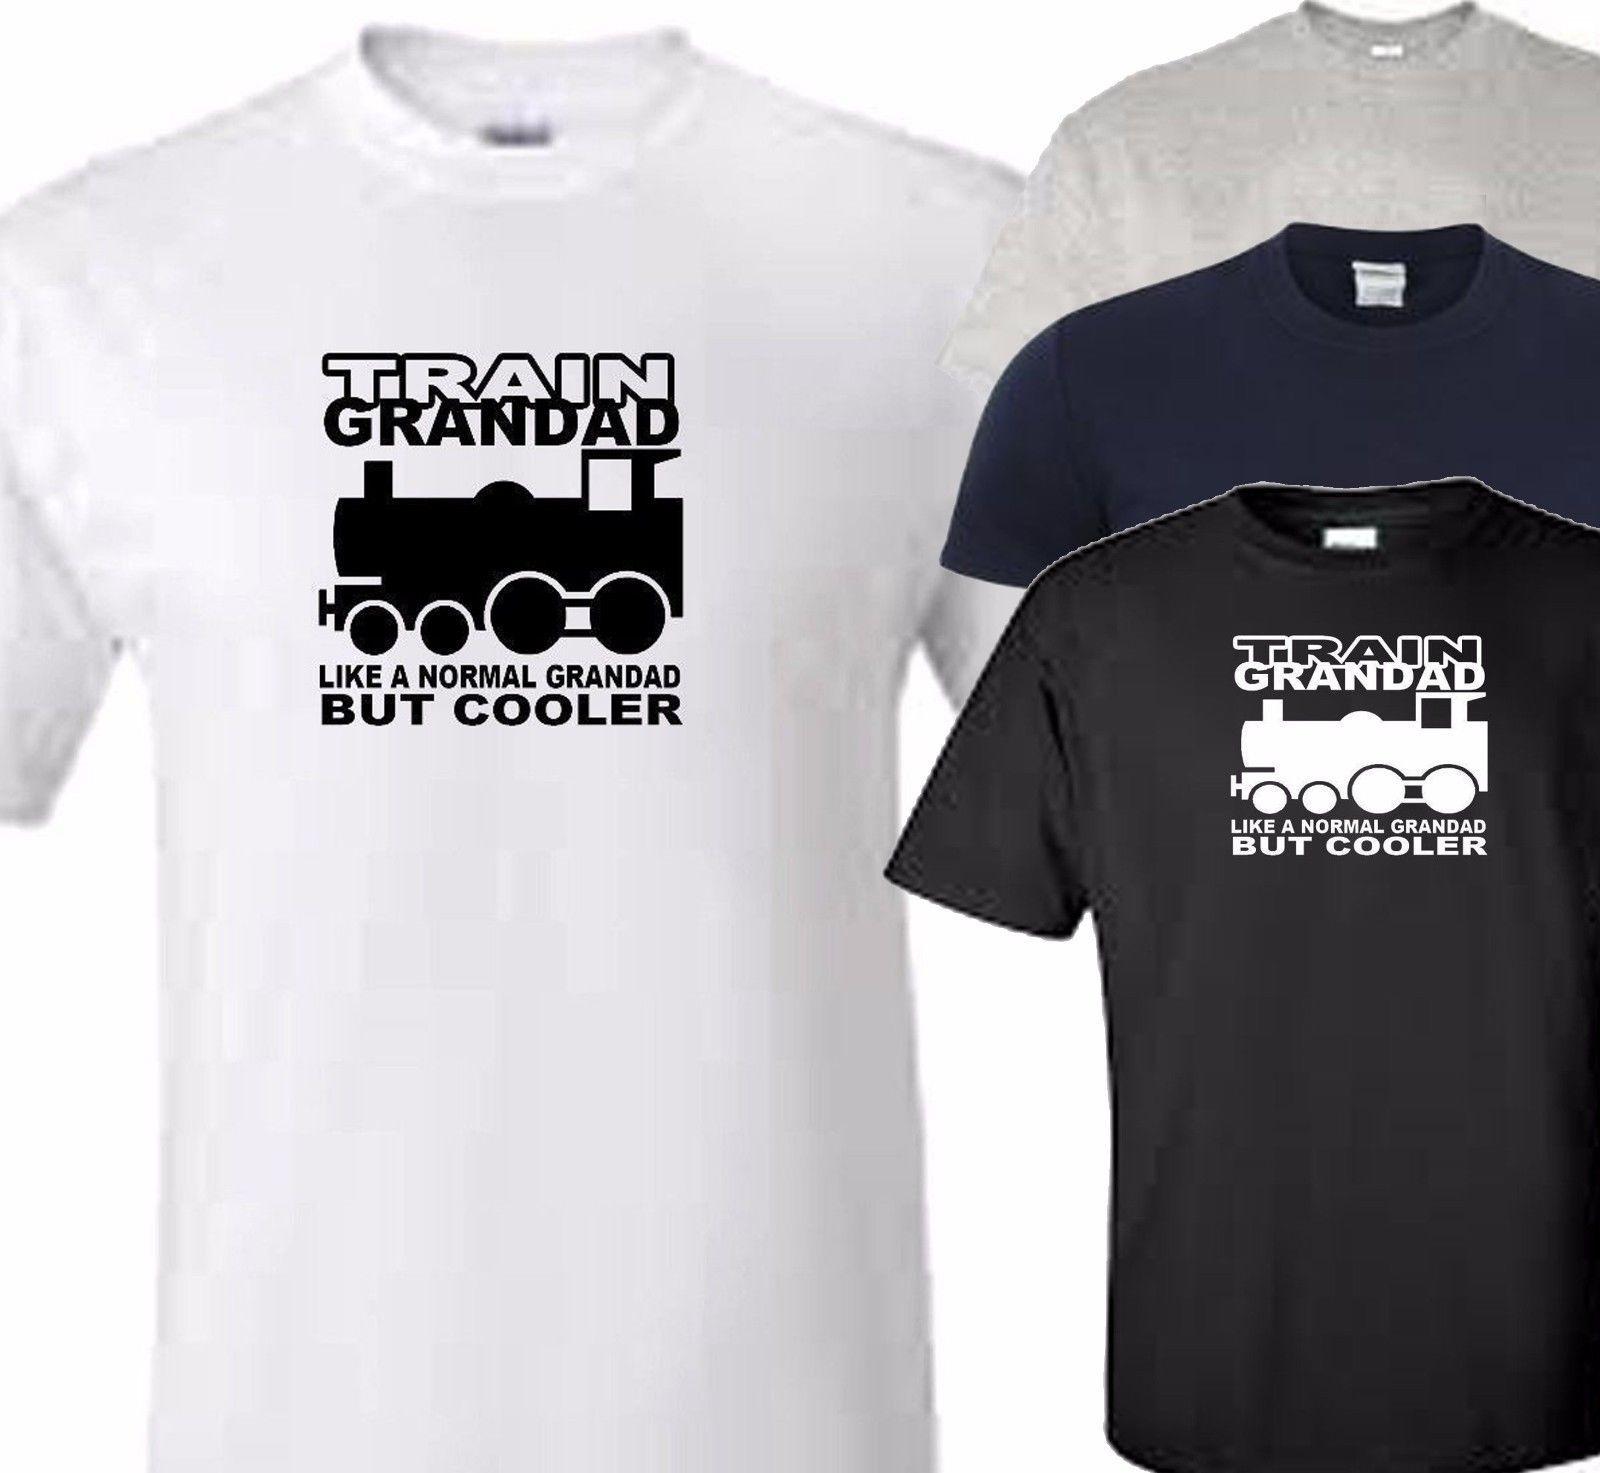 62a6e795 Train Grandad T Shirt Funny Unisex Casual Awesome T Shirt Design Shirt And  Tshirt From Pickapair, $12.96| DHgate.Com